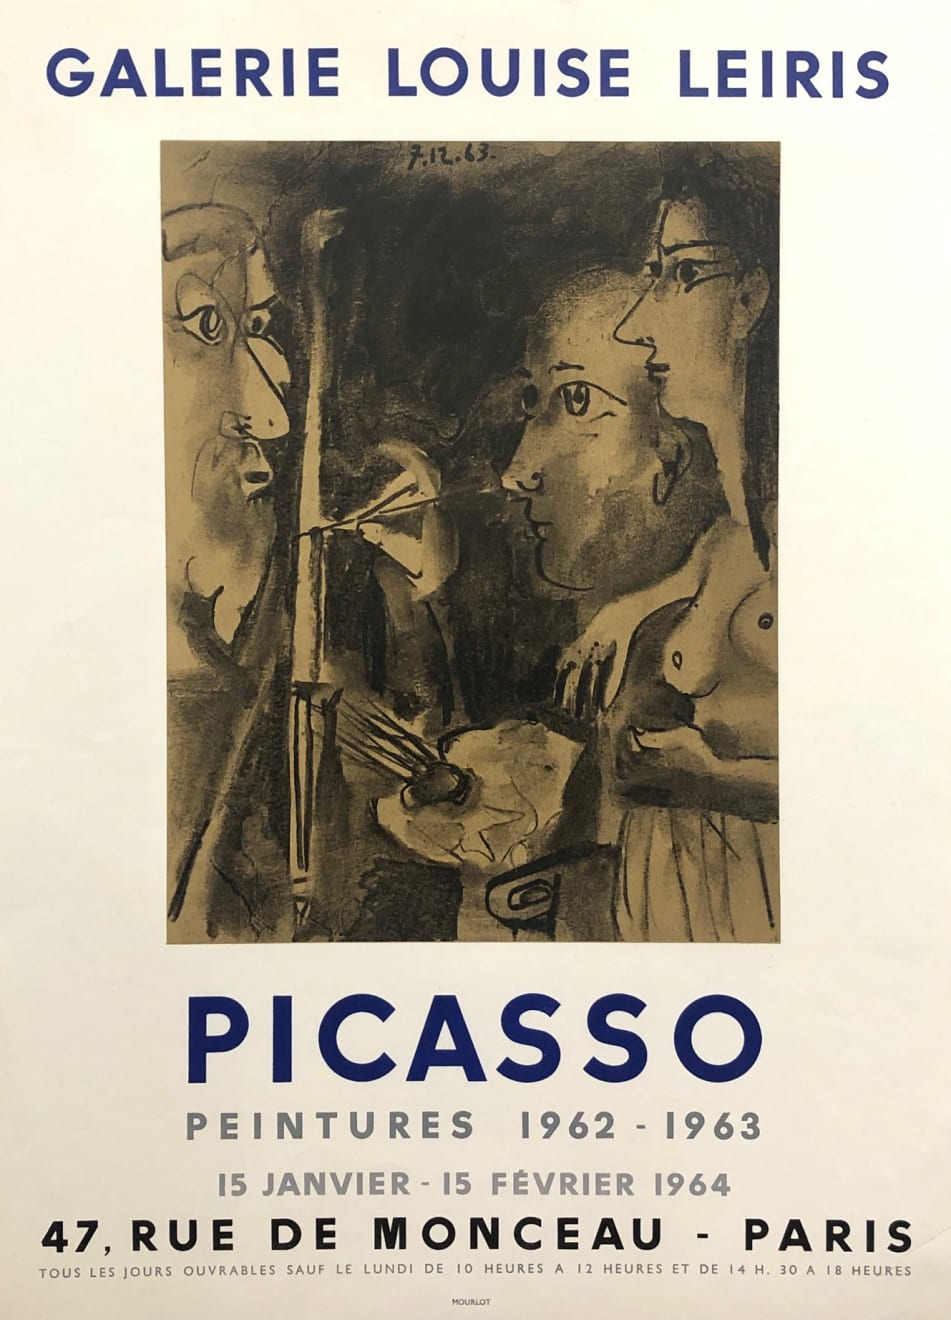 Pablo Picasso, Picasso Peintures 1962 - 1963 Exhibition Poster, 1964